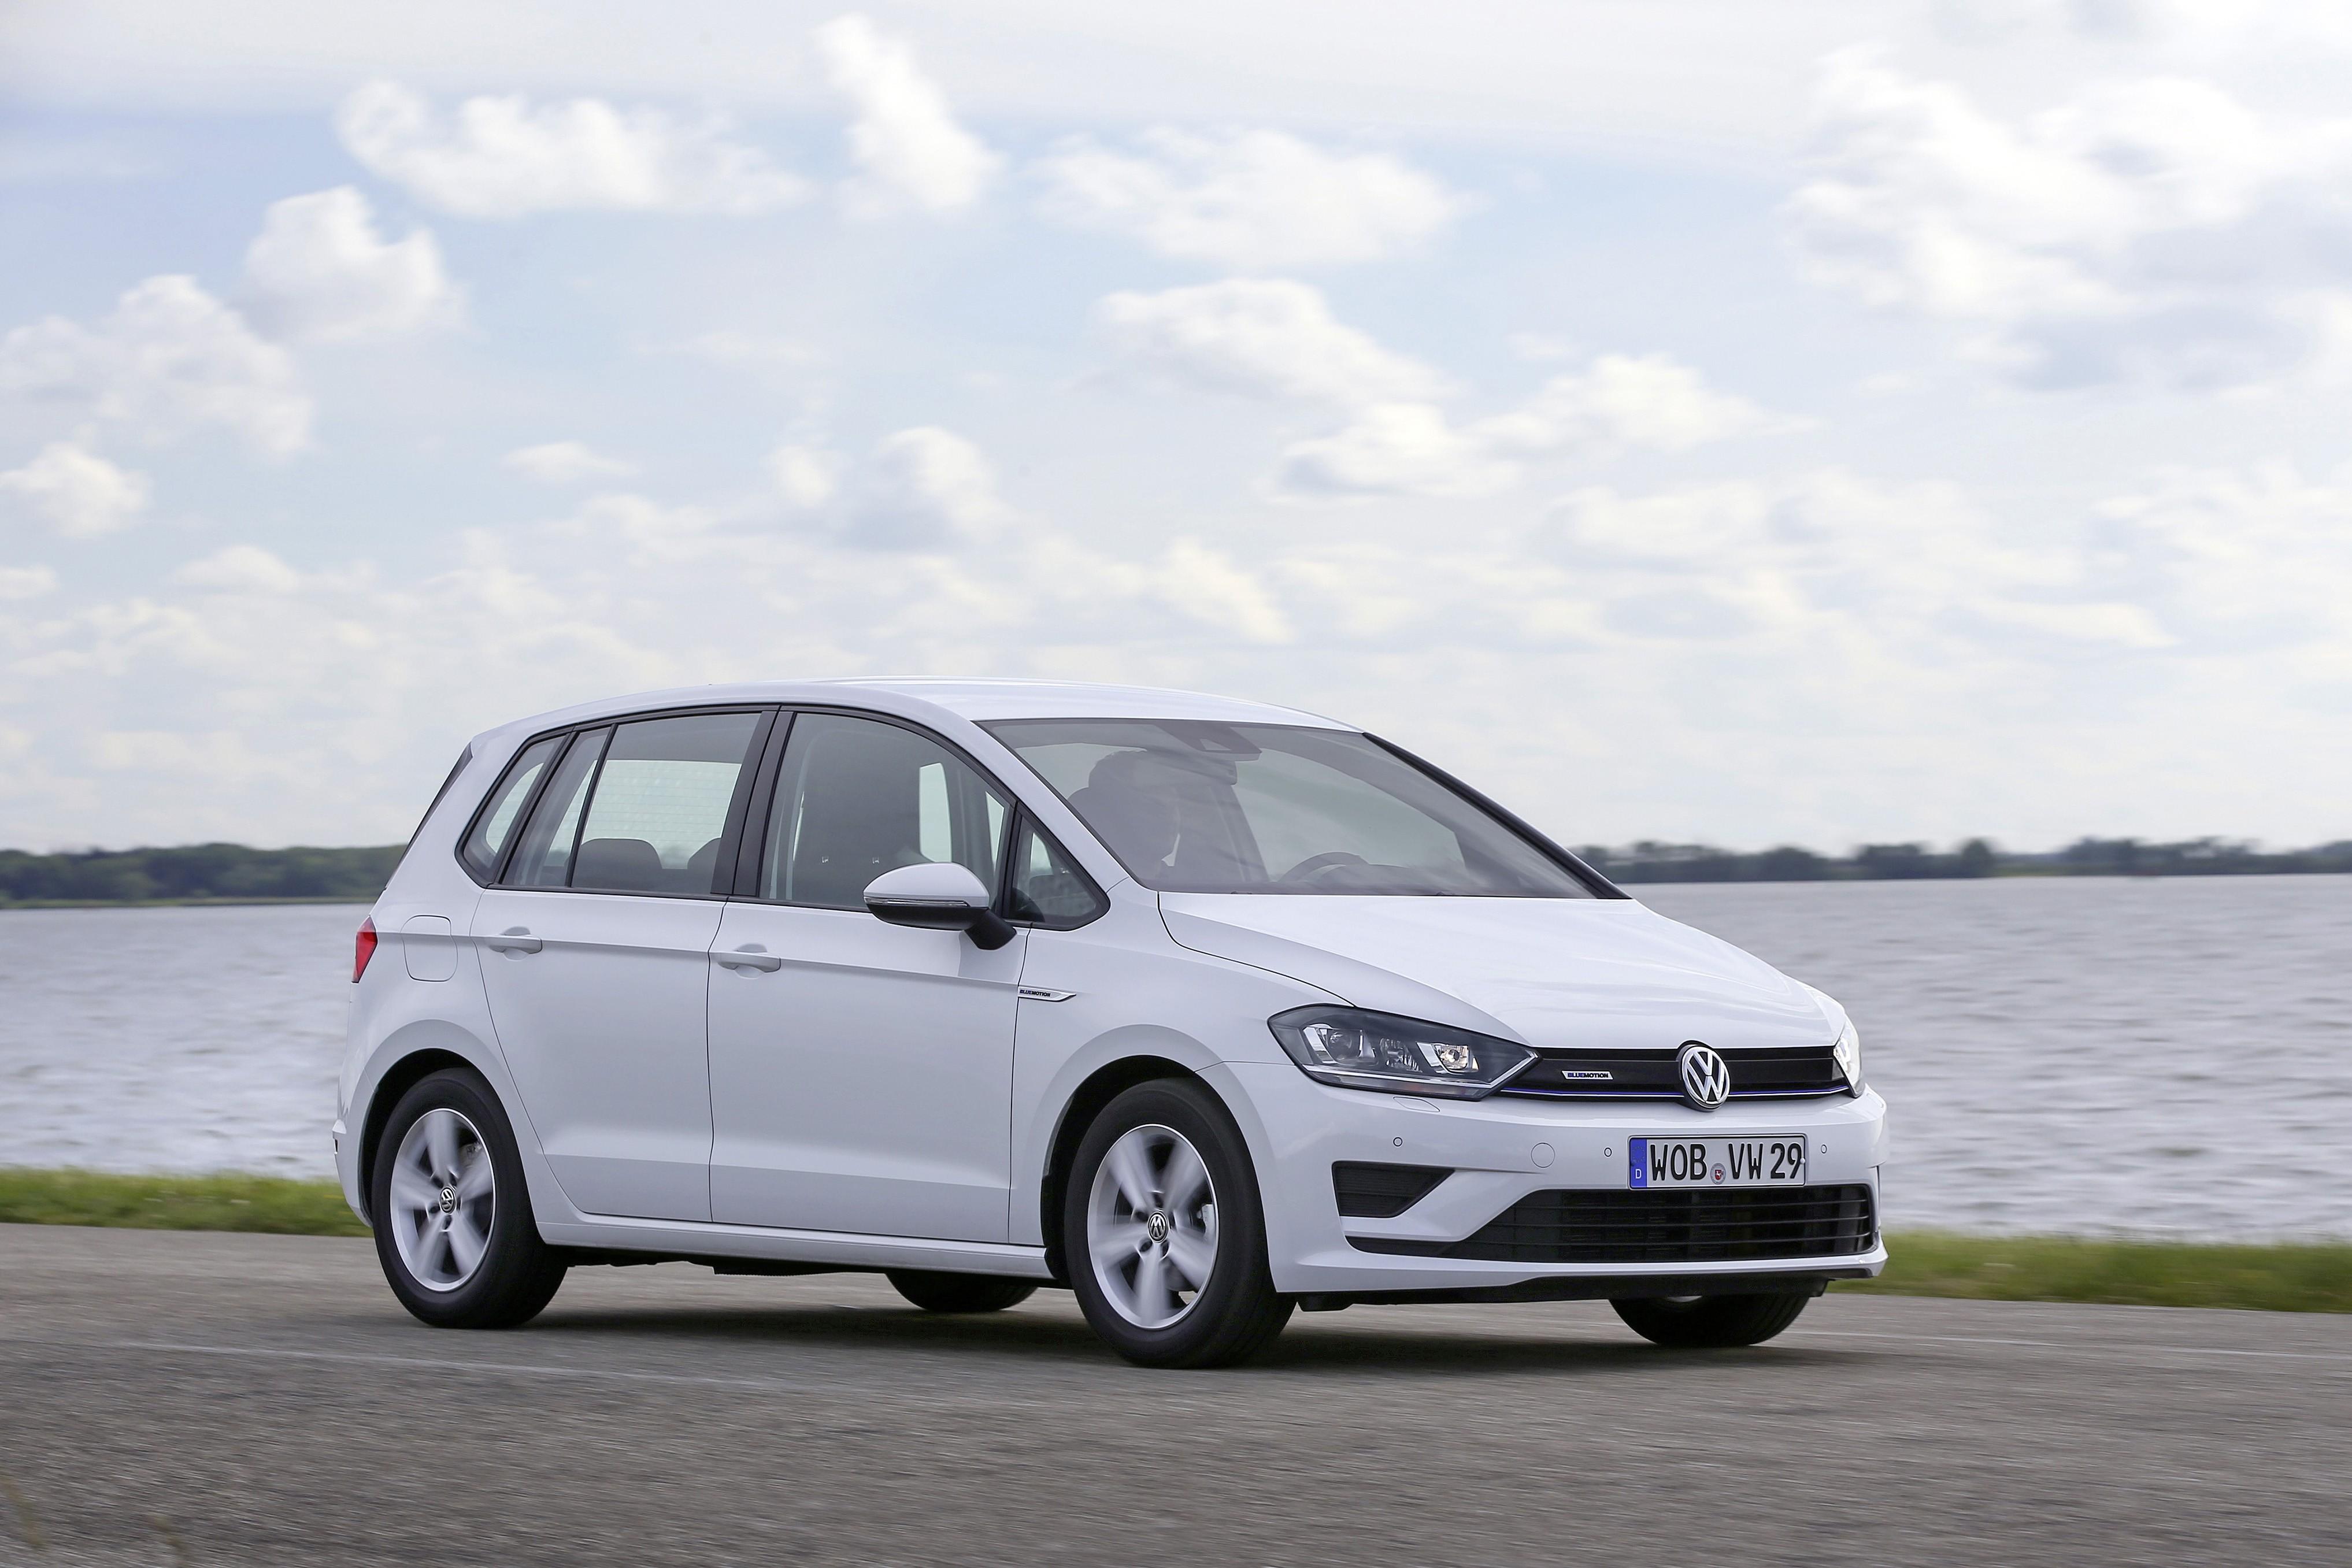 volkswagen reveals golf sportsvan tsi bluemotion with 1 liter engine autoevolution. Black Bedroom Furniture Sets. Home Design Ideas